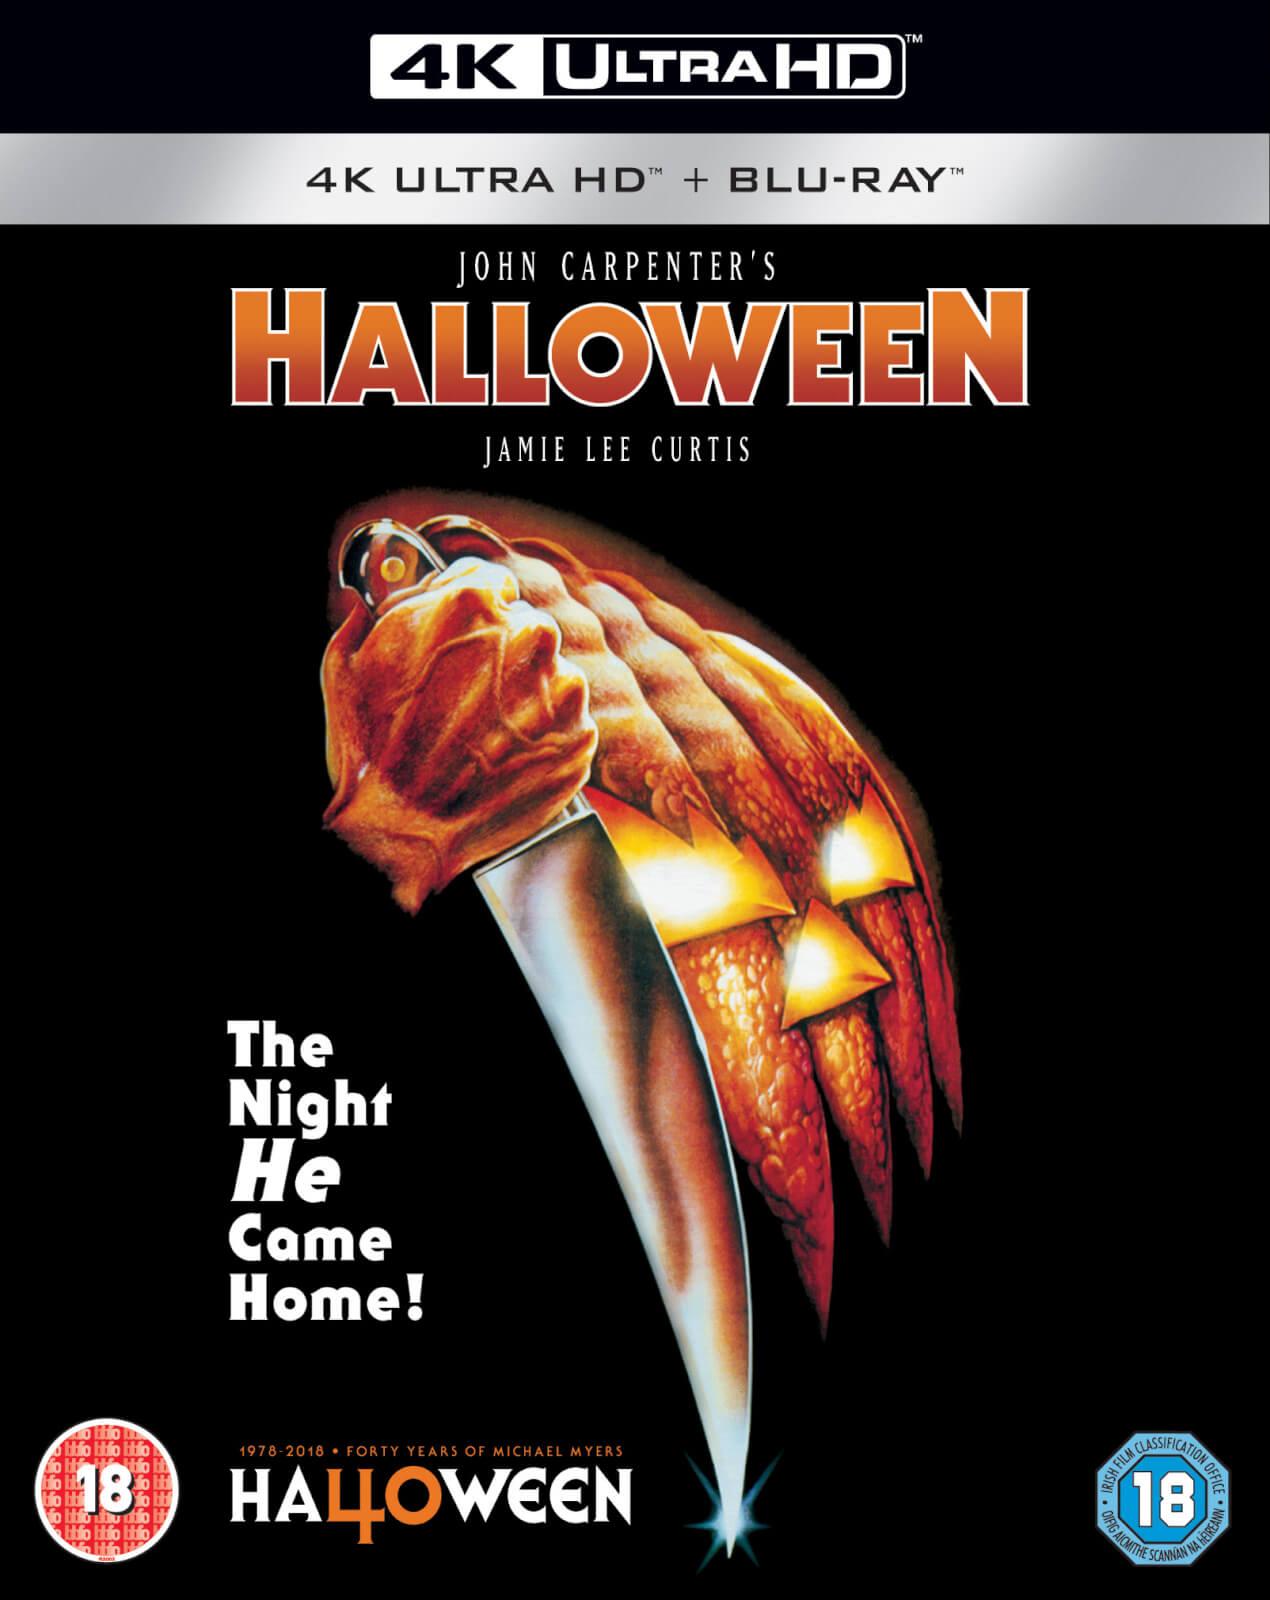 halloween - 4k ultra hd 40th anniversary edition blu-ray | zavvi